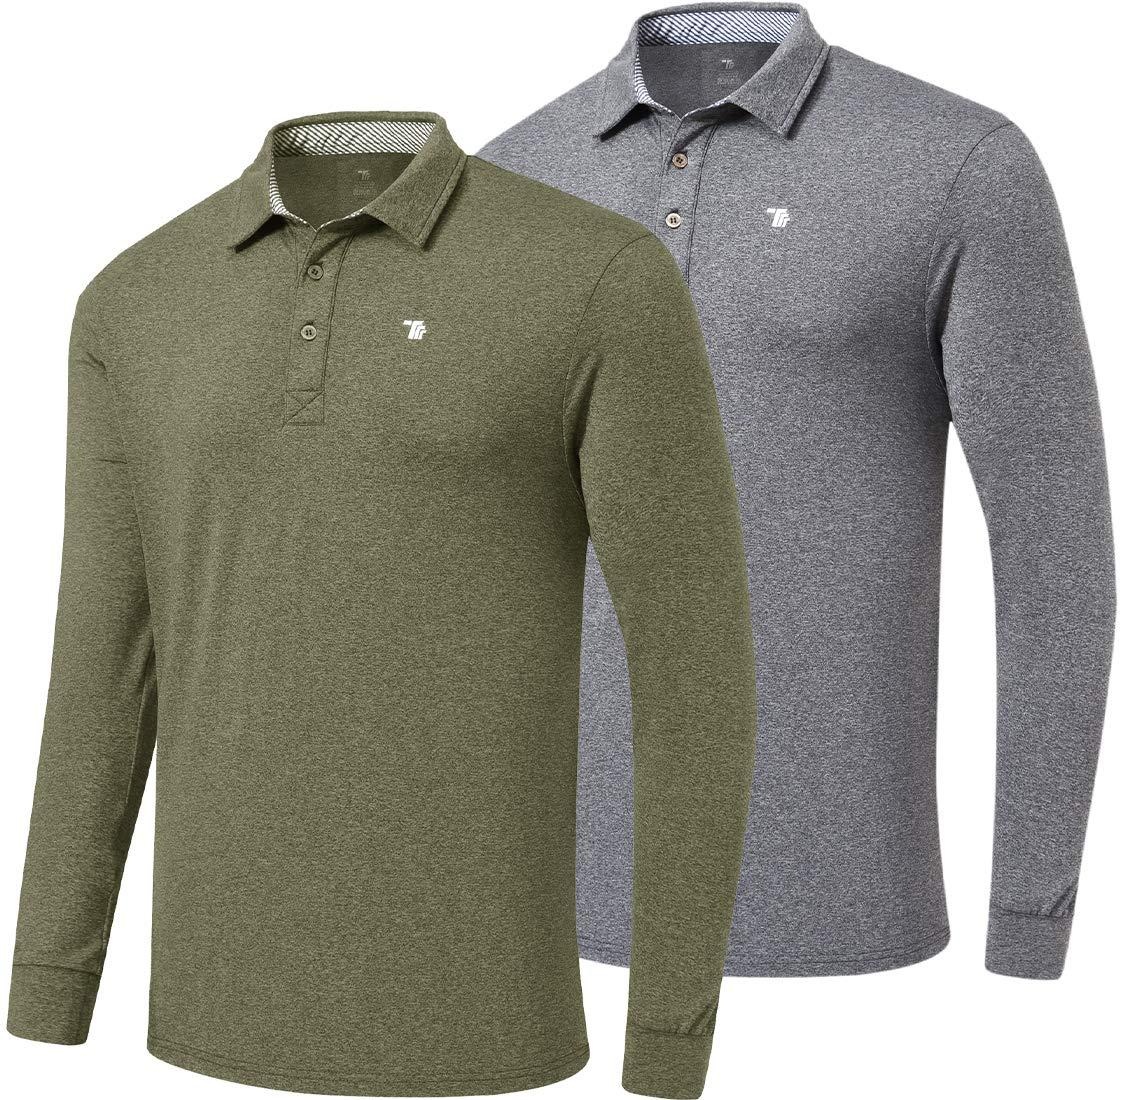 MoFiz Men's Golf Shirt Long Sleeve Polo Shirt Quick Dry Sport Polo Shirts Athletic T-Shirt